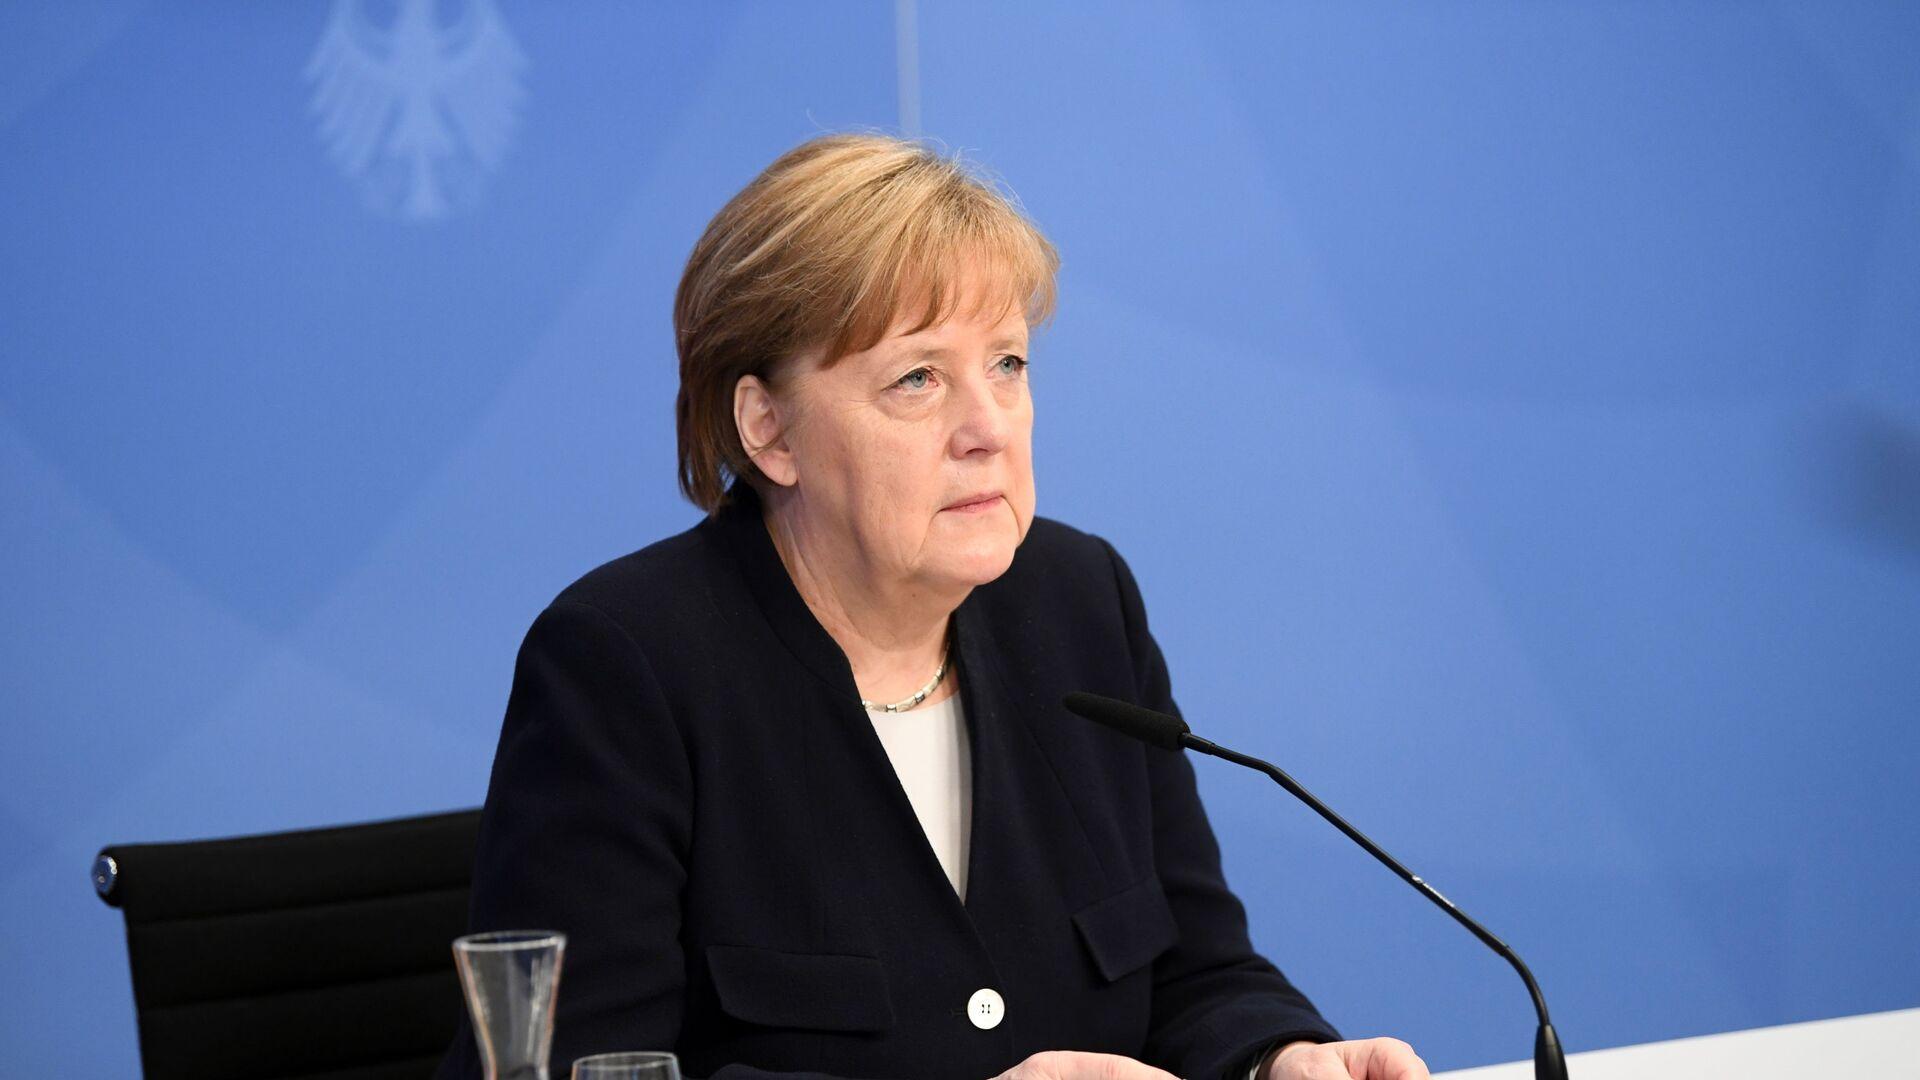 Kanclerz Niemiec Angela Merkel. - Sputnik Polska, 1920, 19.06.2021